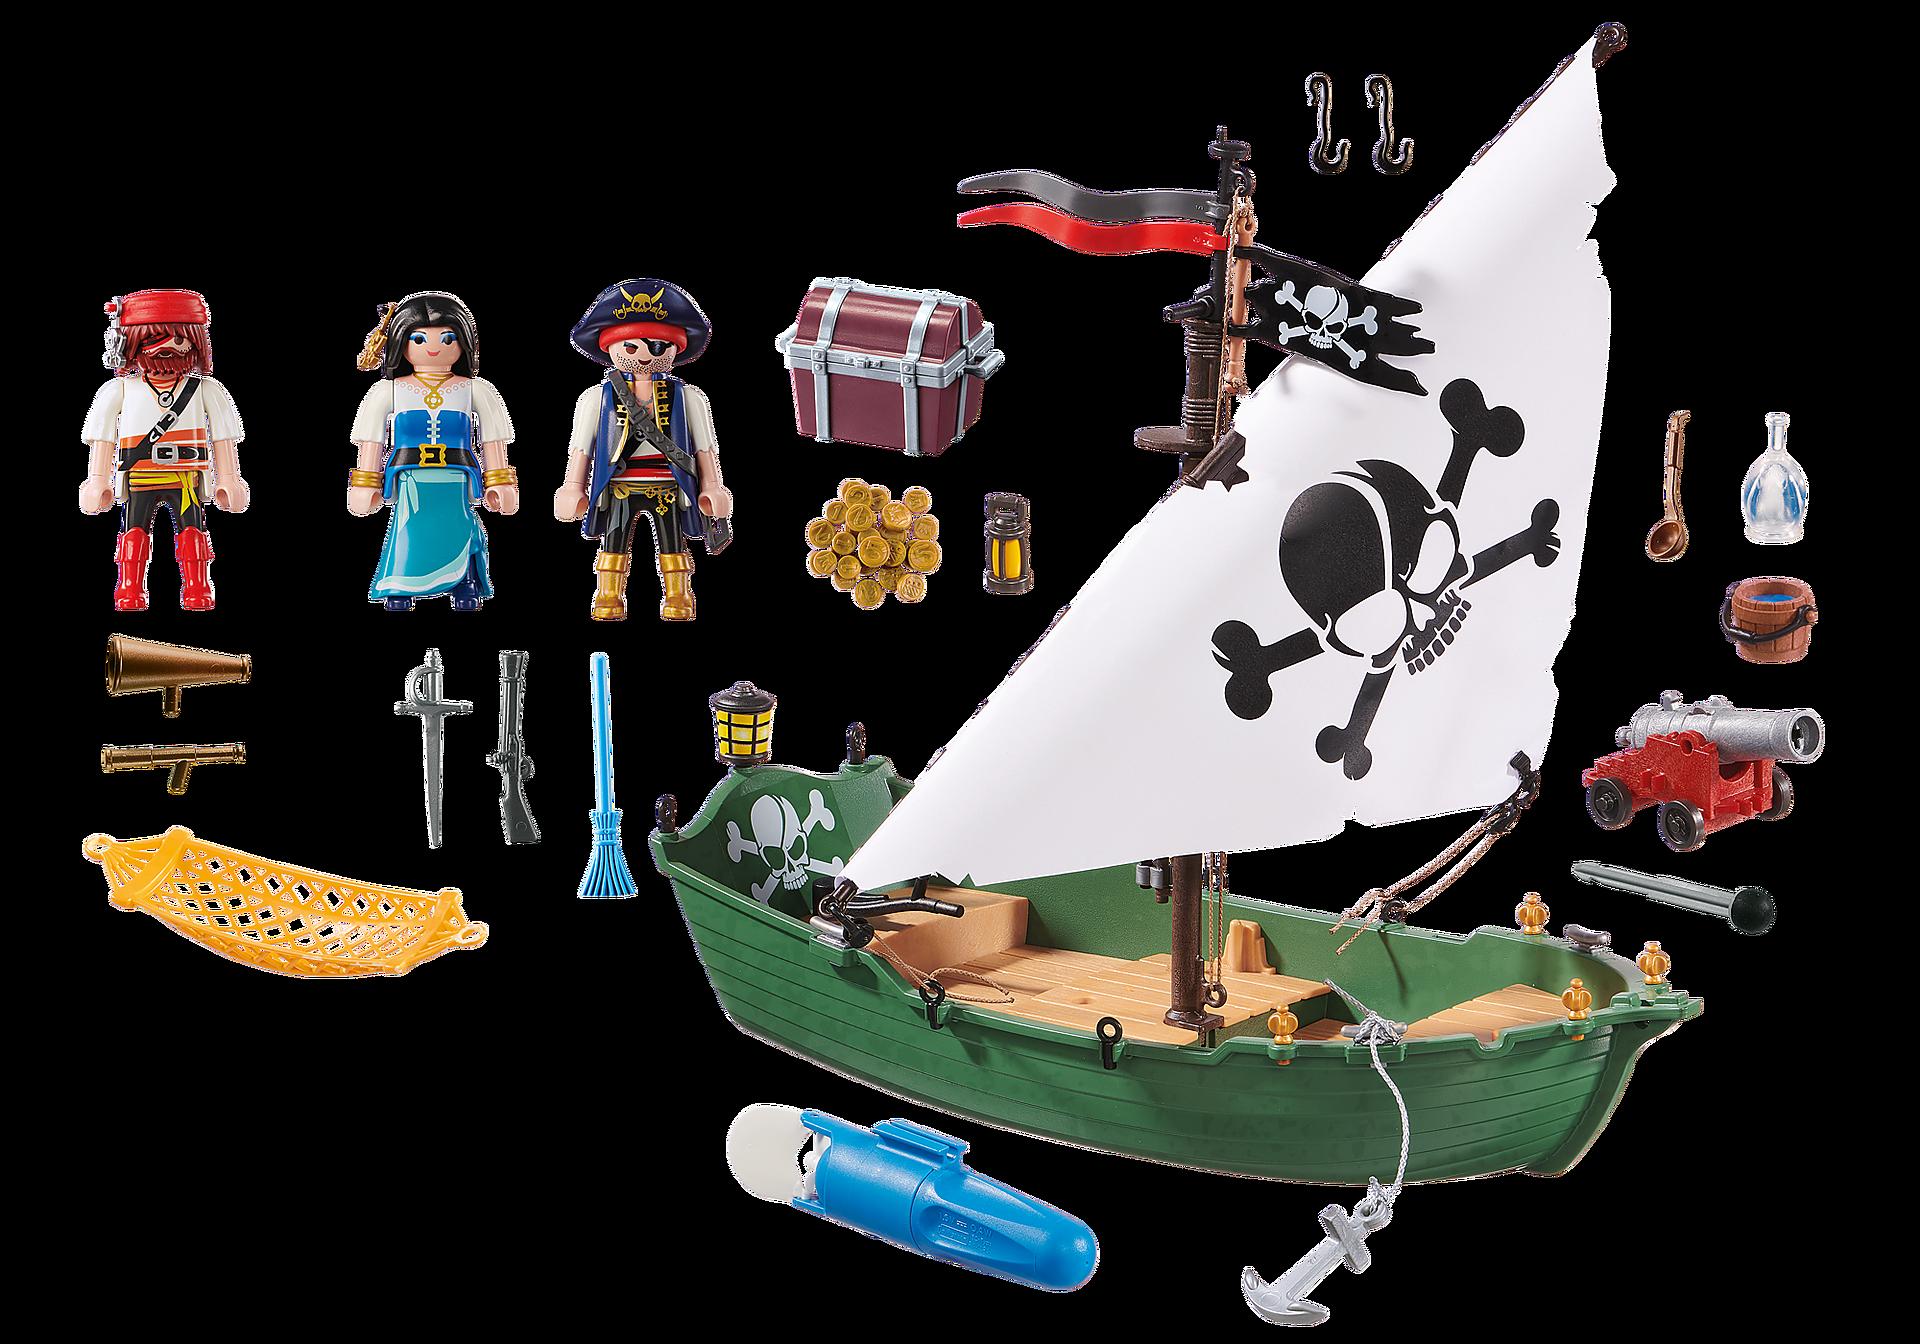 70151 Barco Pirata con motor submarino zoom image3